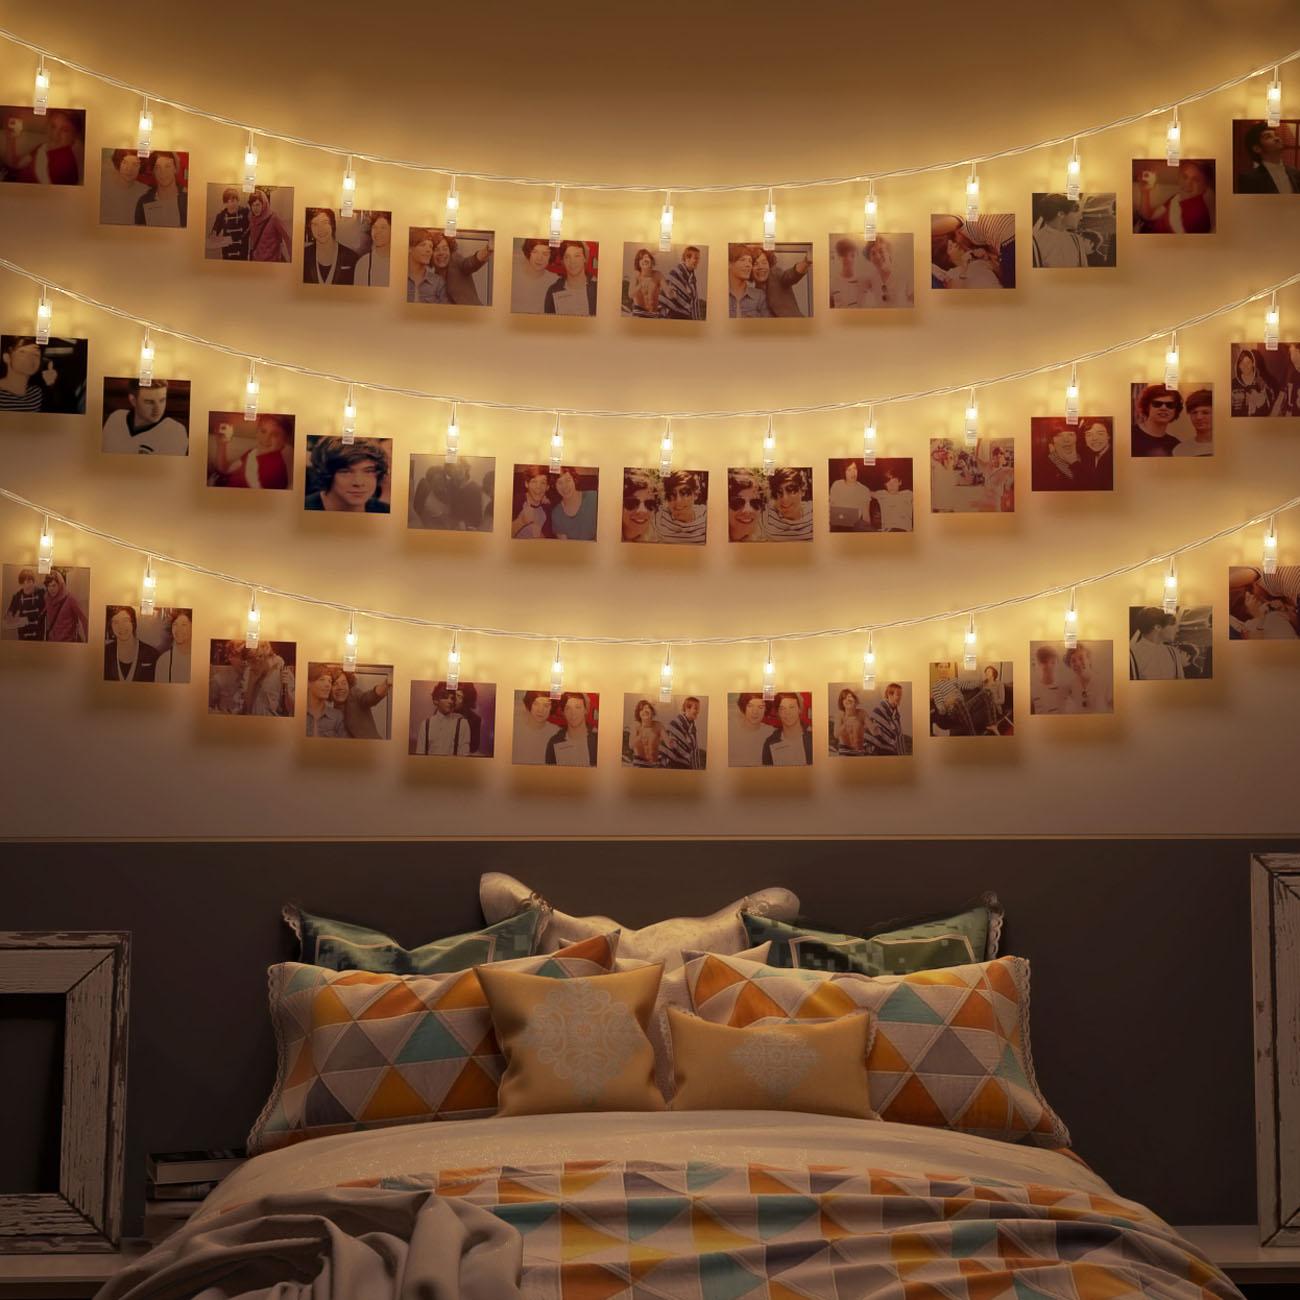 LED Fotolichterkette mit 40 Foto Clips 5m - 5